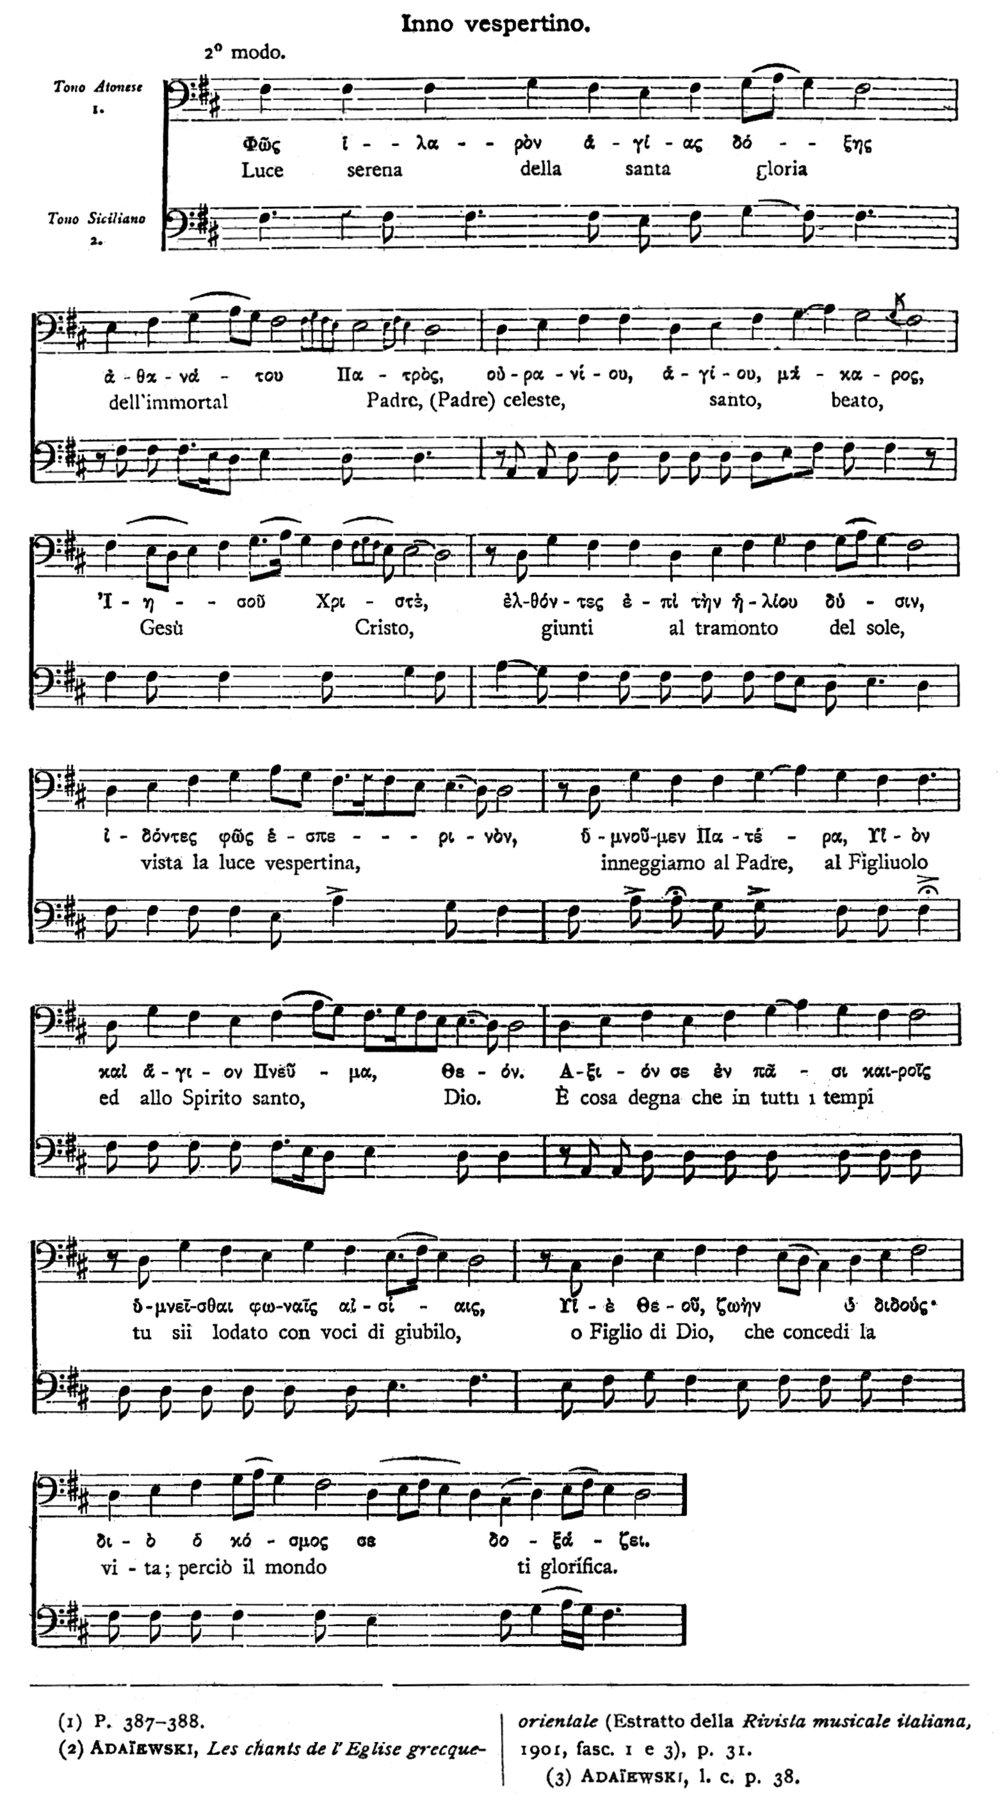 Fig. 3.   Rassegna Gregoriana,  vol. 4 (Rome, 1905), pp. 400-401.